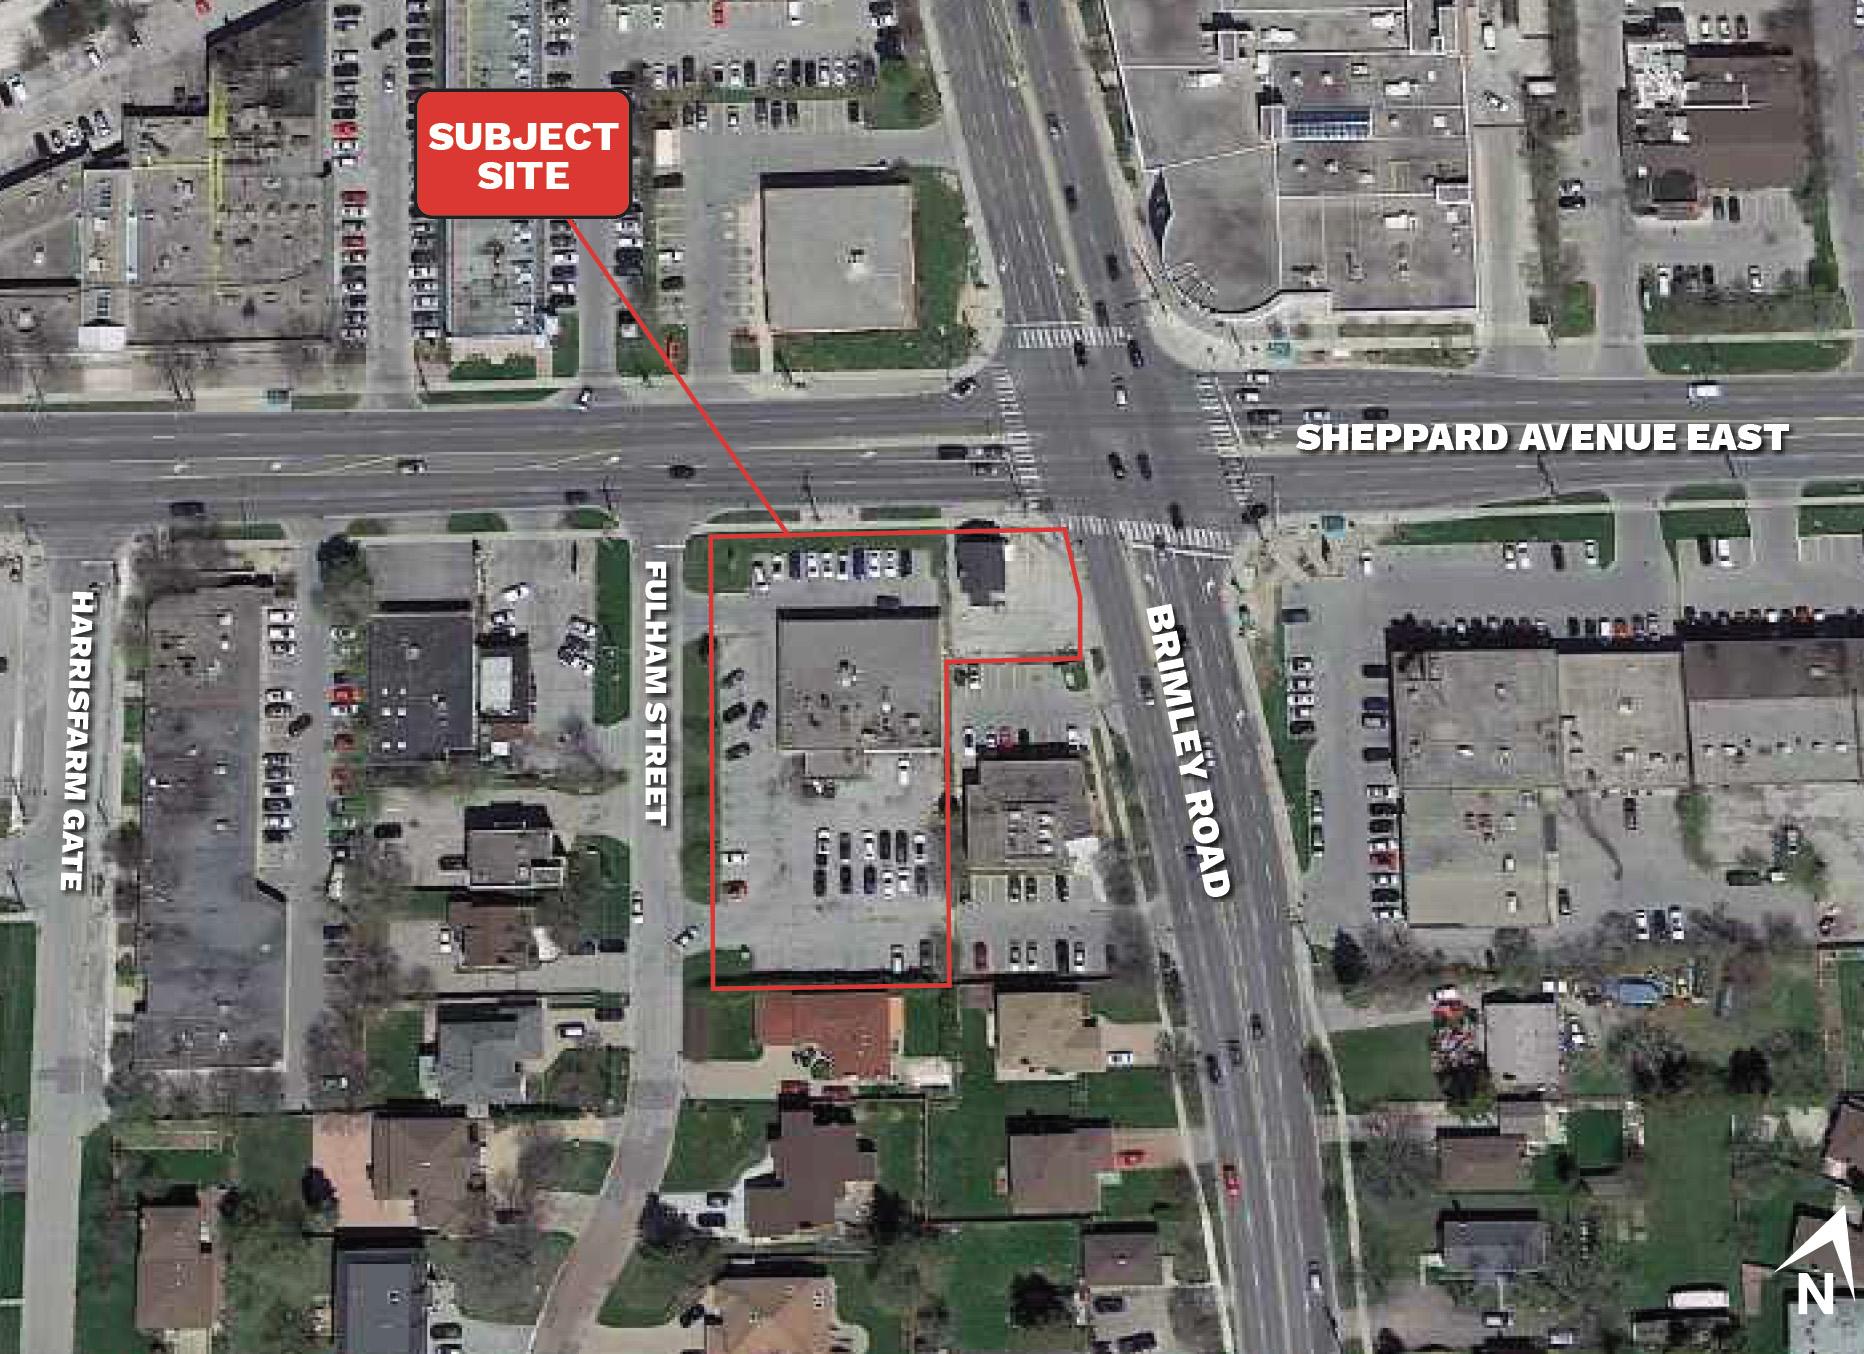 4415-4421 Sheppard Avenue East, Toronto, designed by IBI Group for Wintrup Developments.